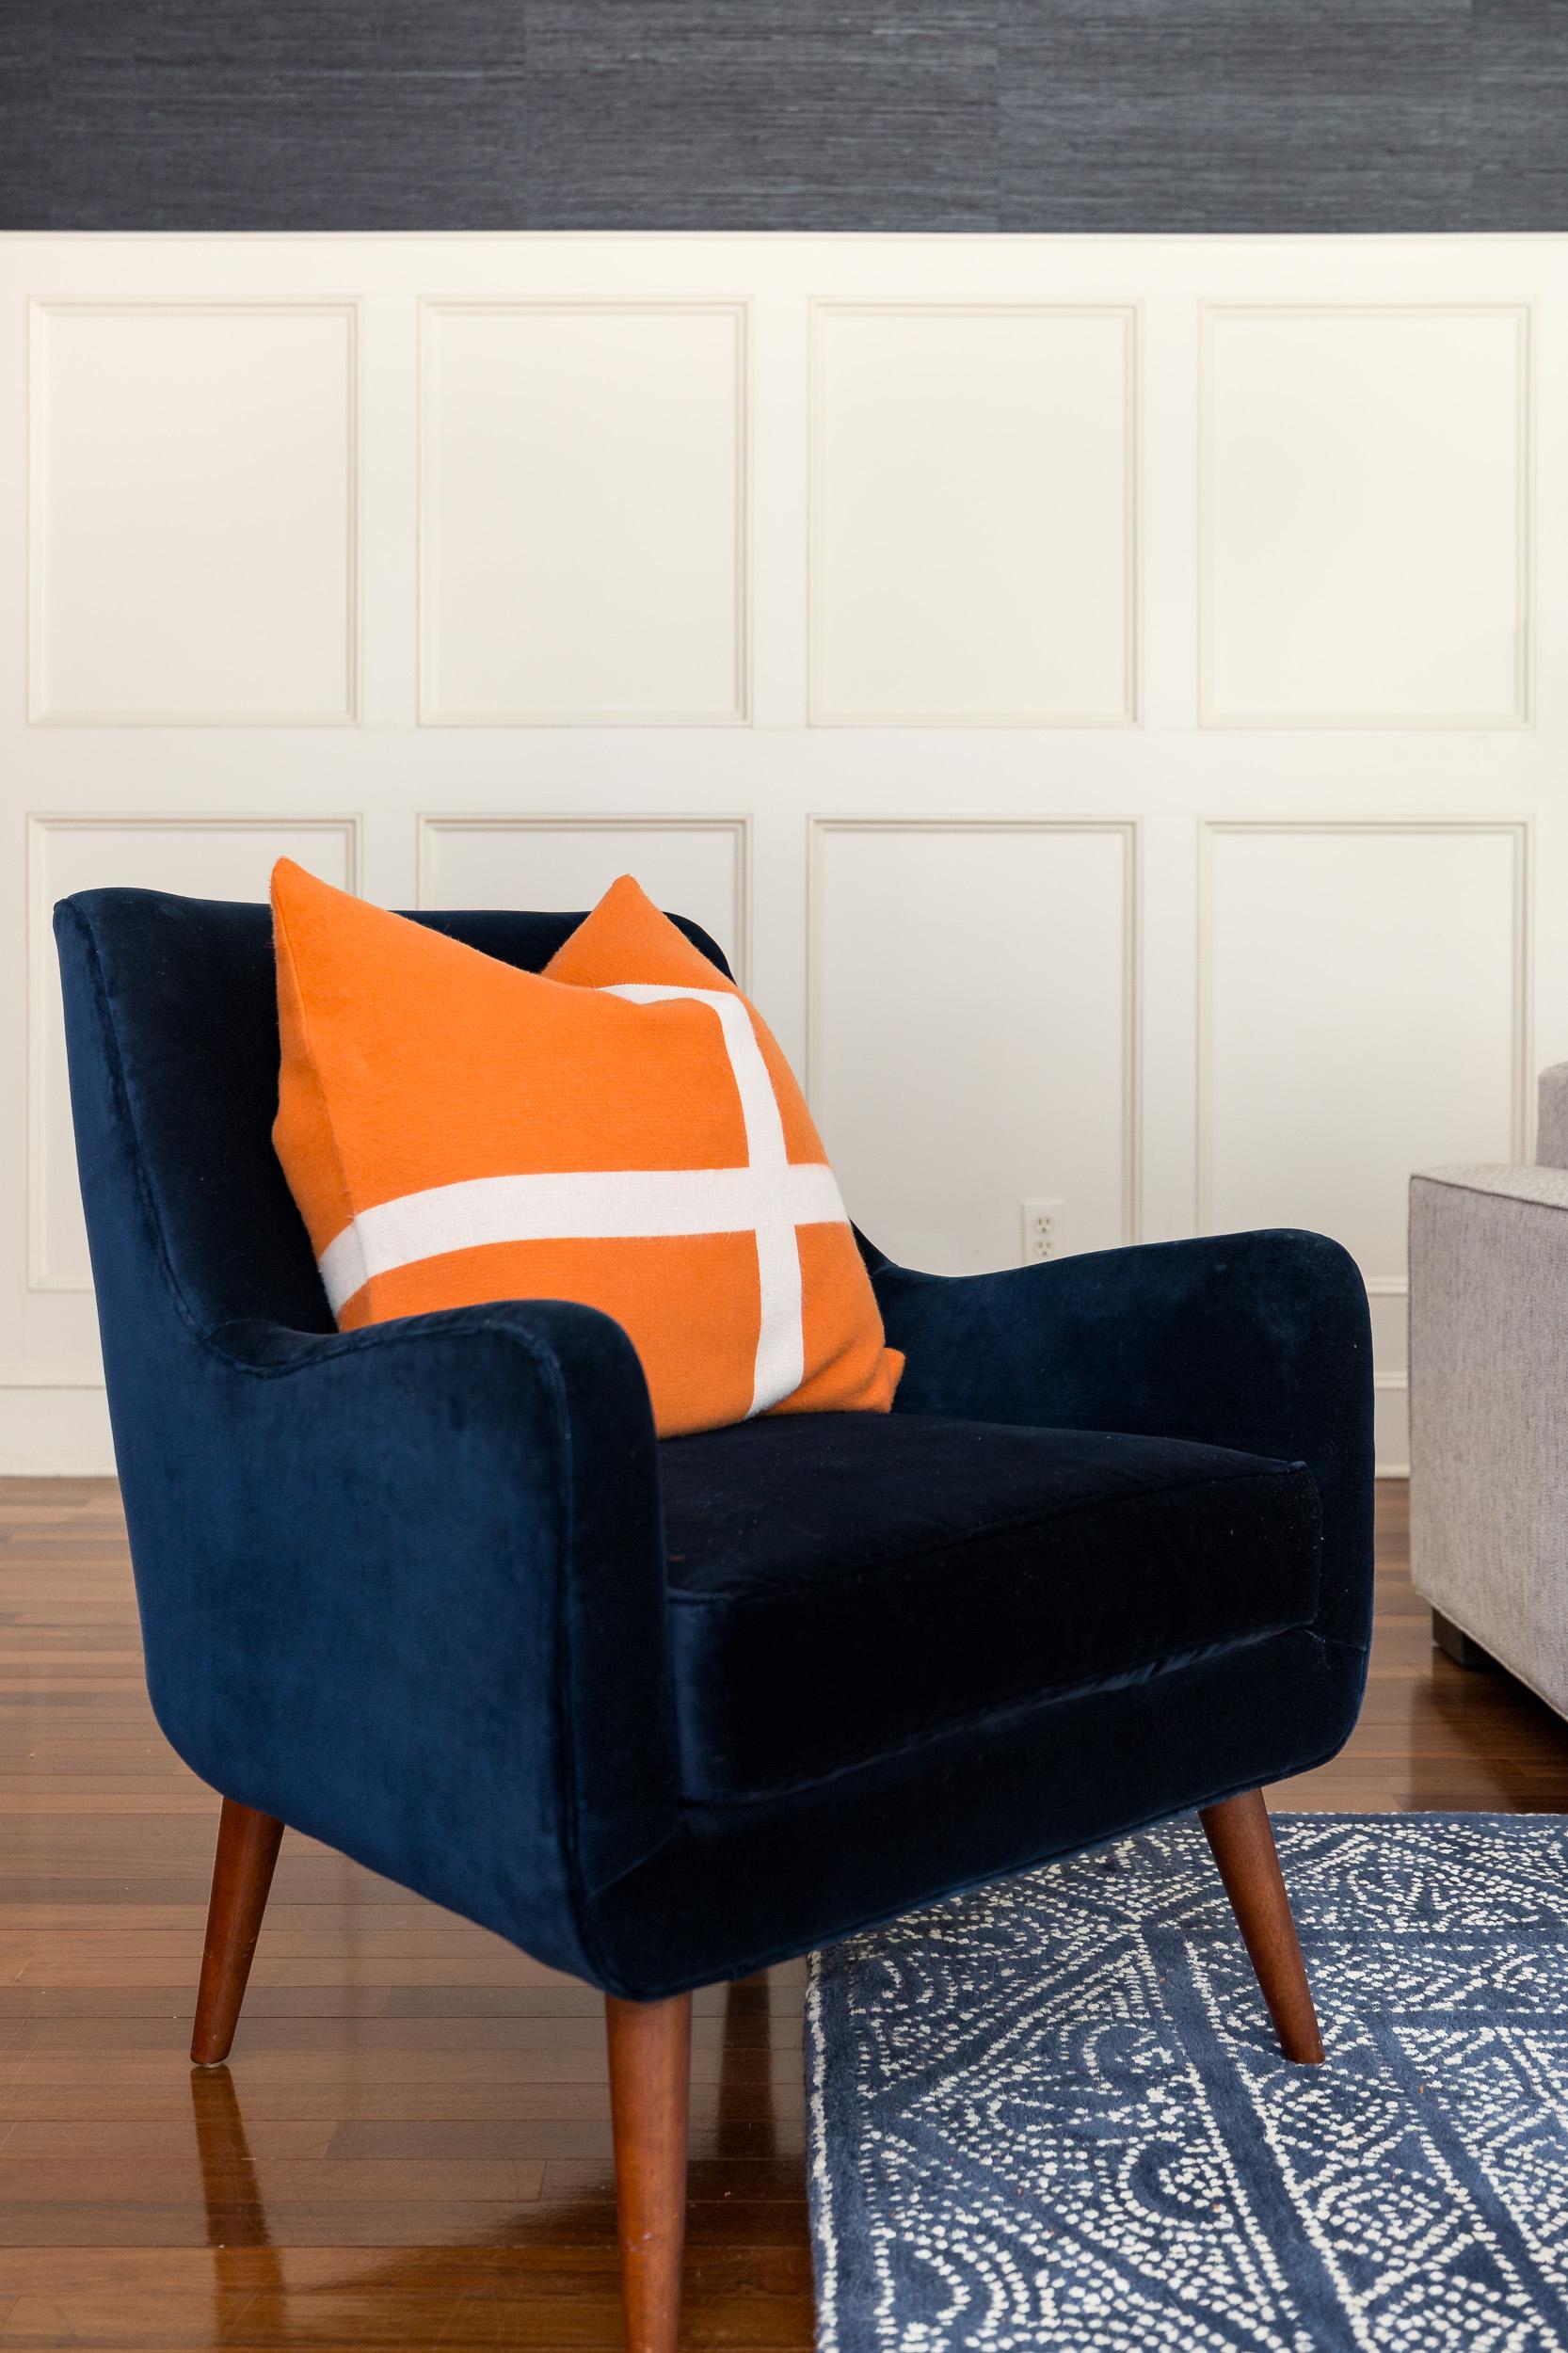 Modern design chair.